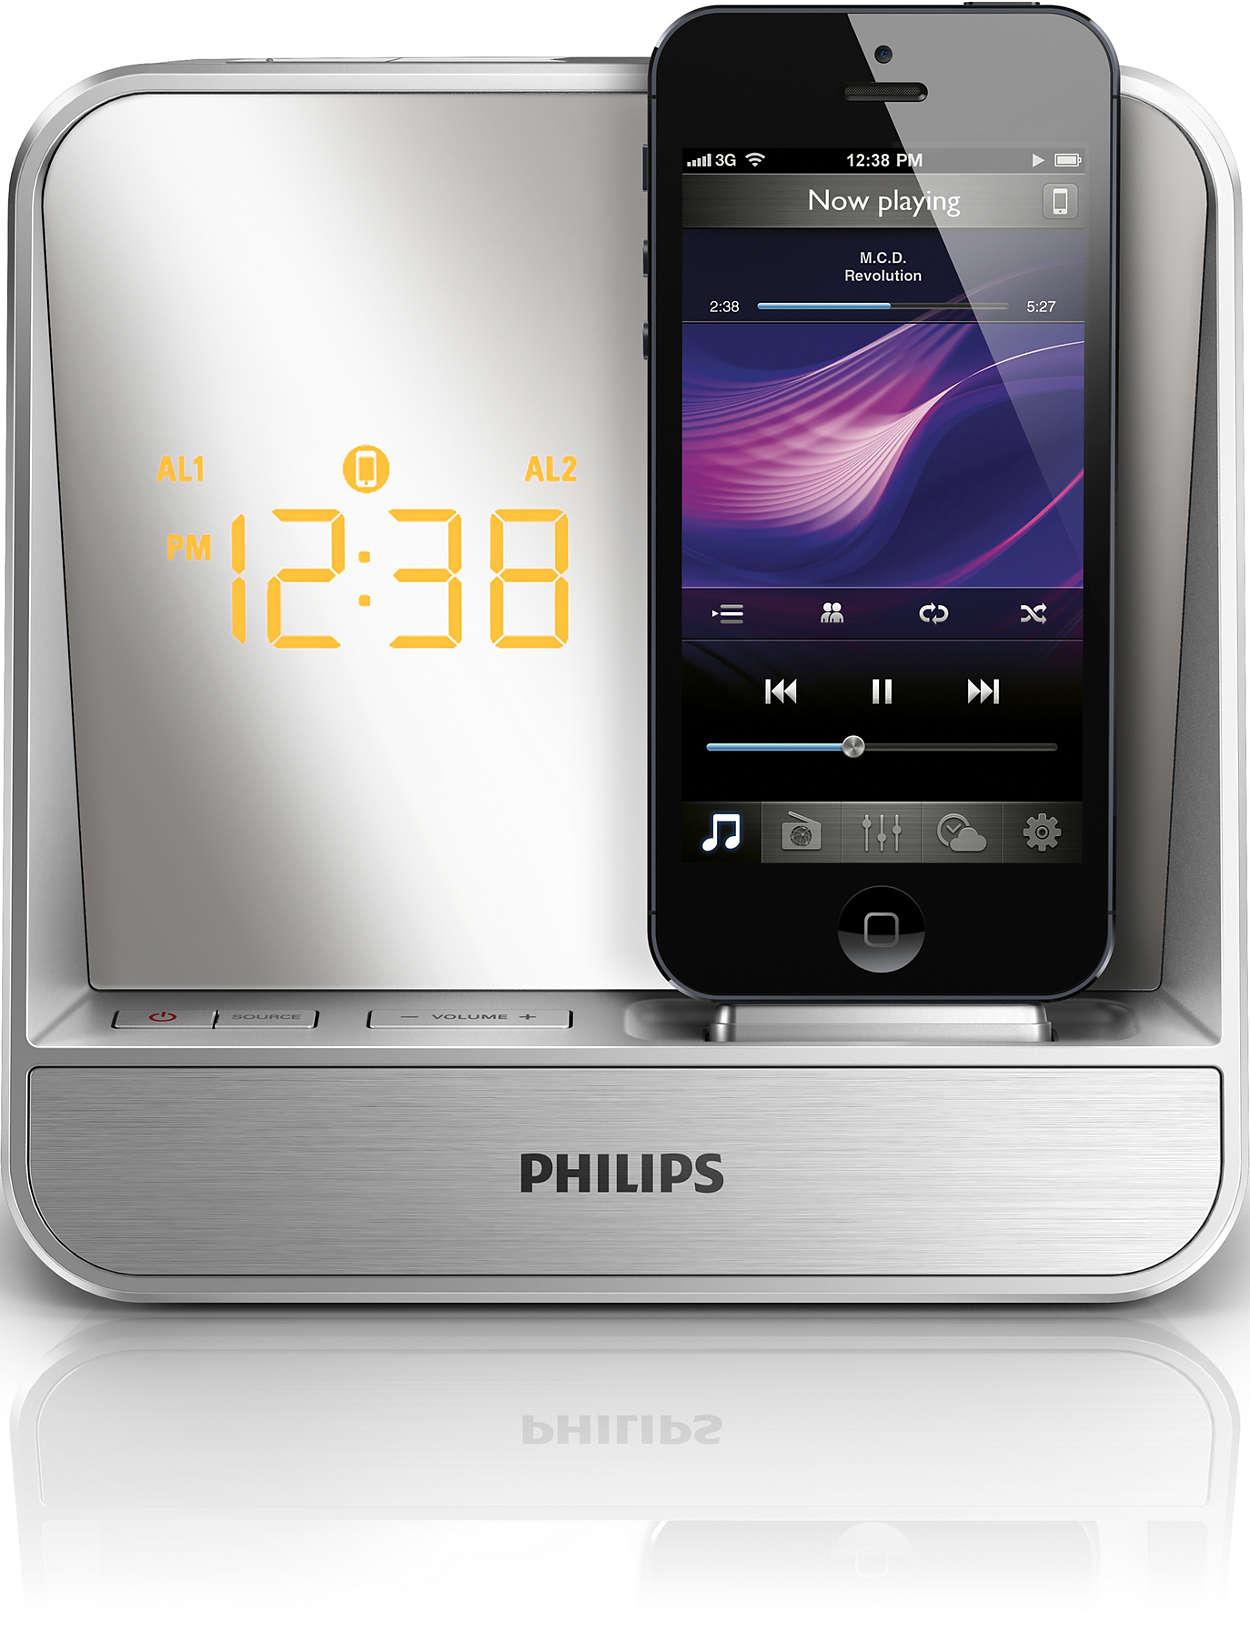 Alarm Clock radio for iPod/iPhone AJ5305D/05 | Philips